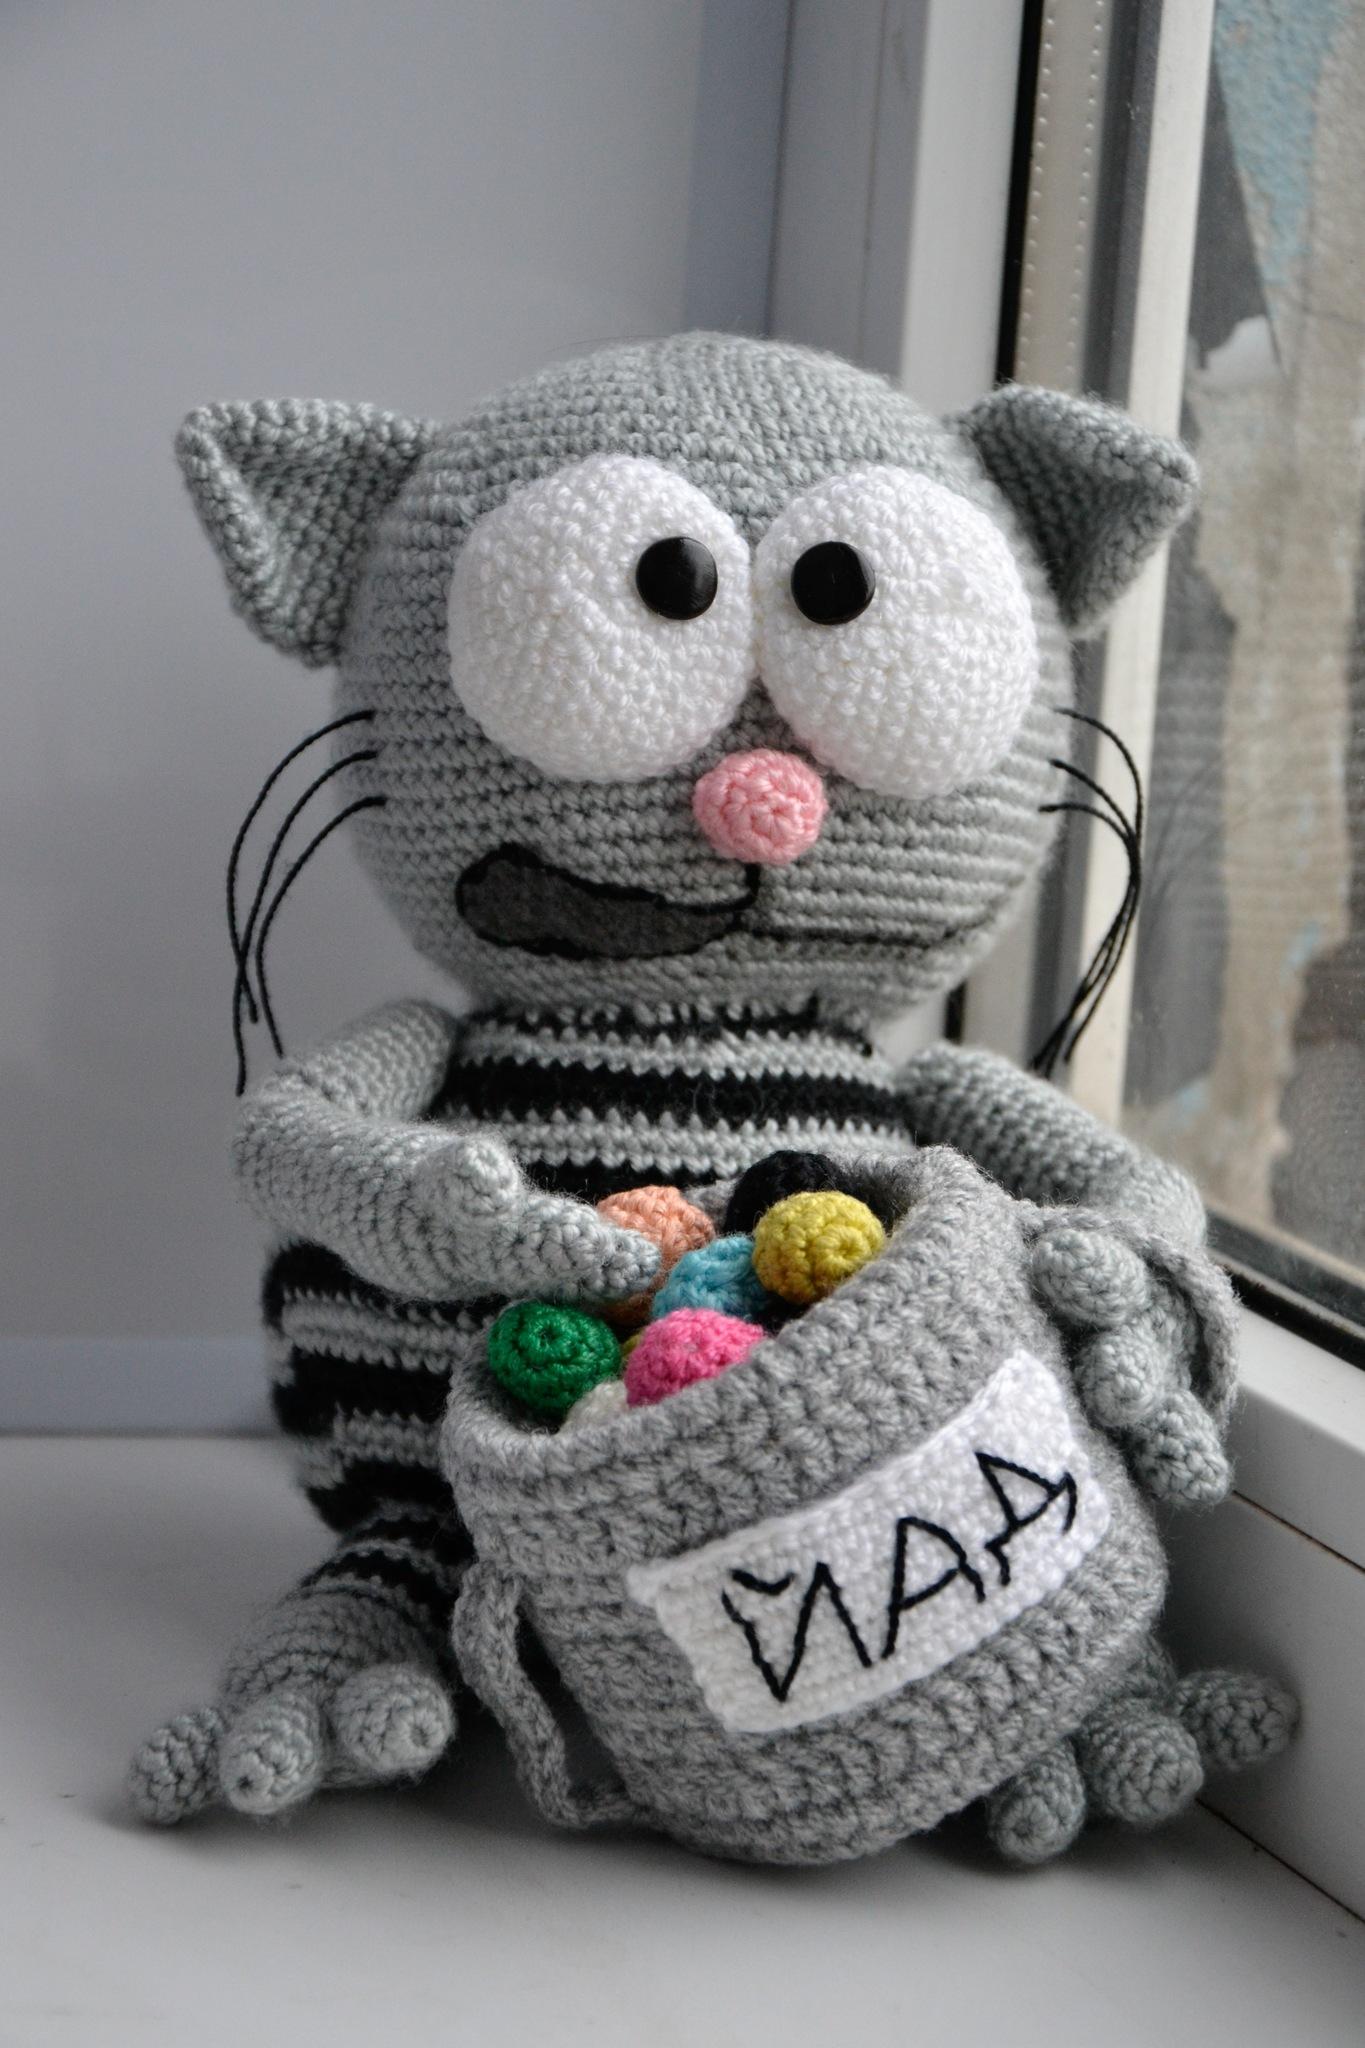 Amigurumi Geek Patterns : Images about crochet geek on pinterest amigurumi